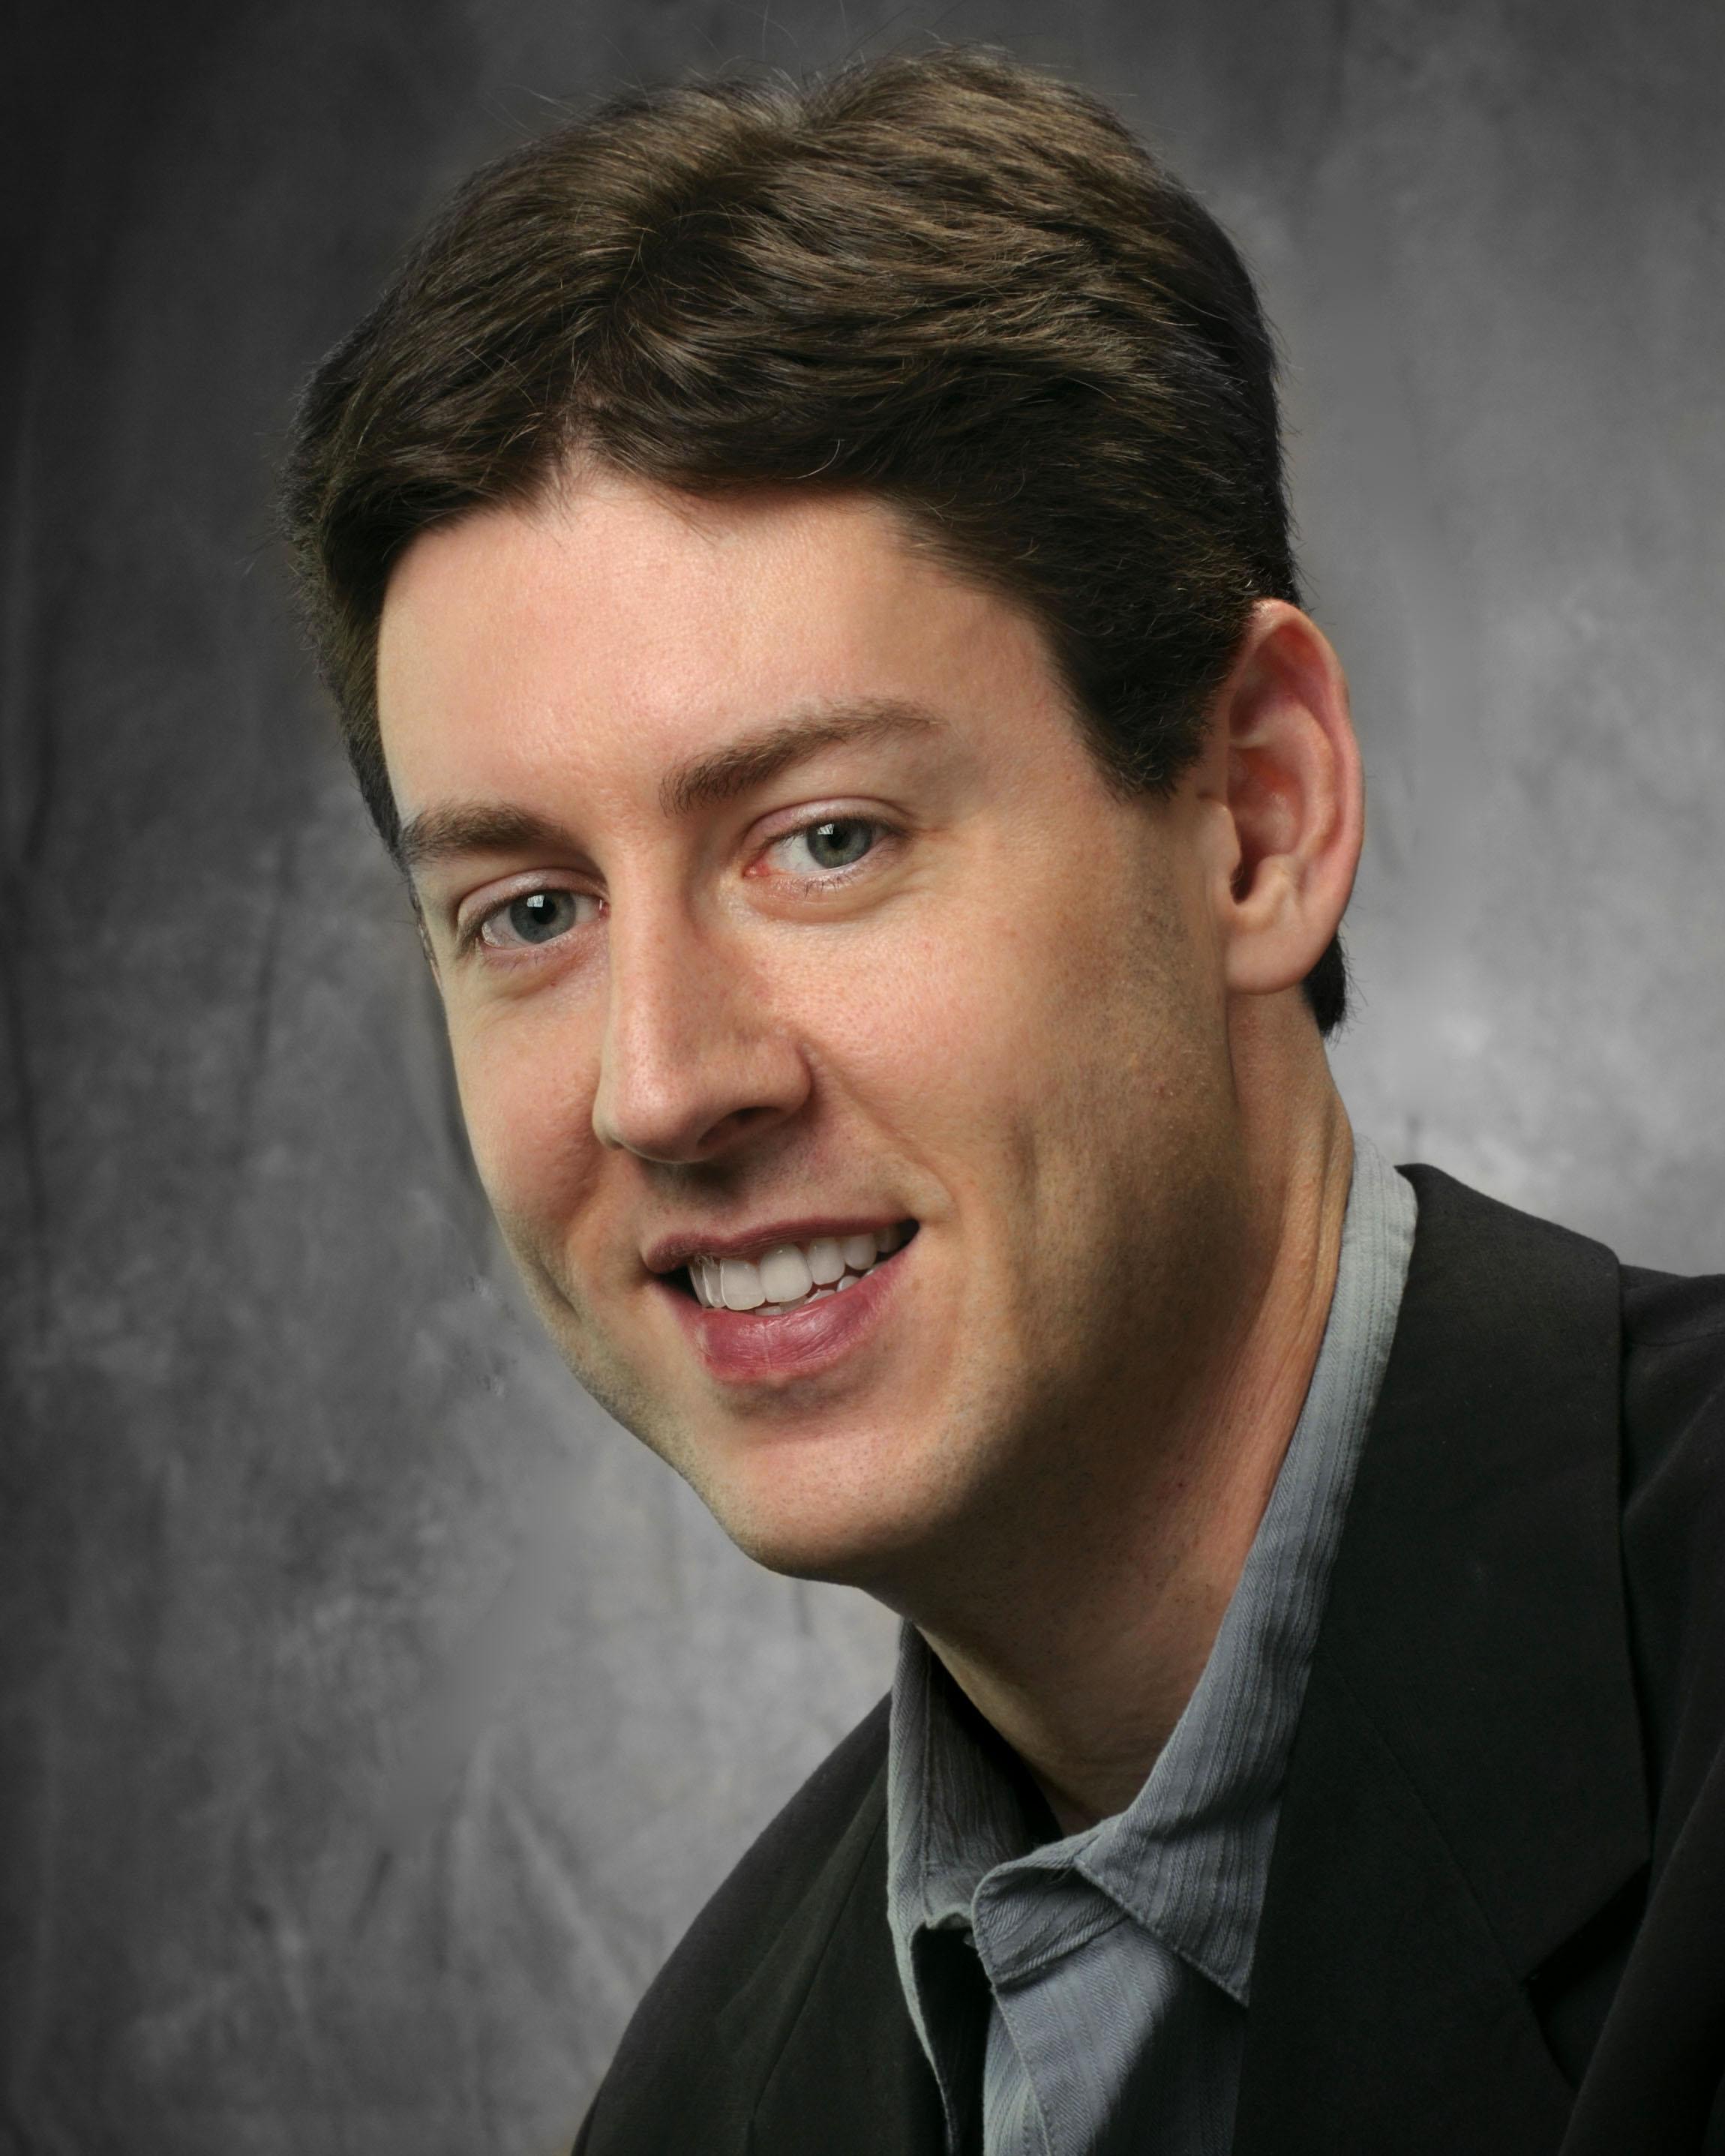 Brad Hieger, Ph.D., a psychologist in Cumming, GA